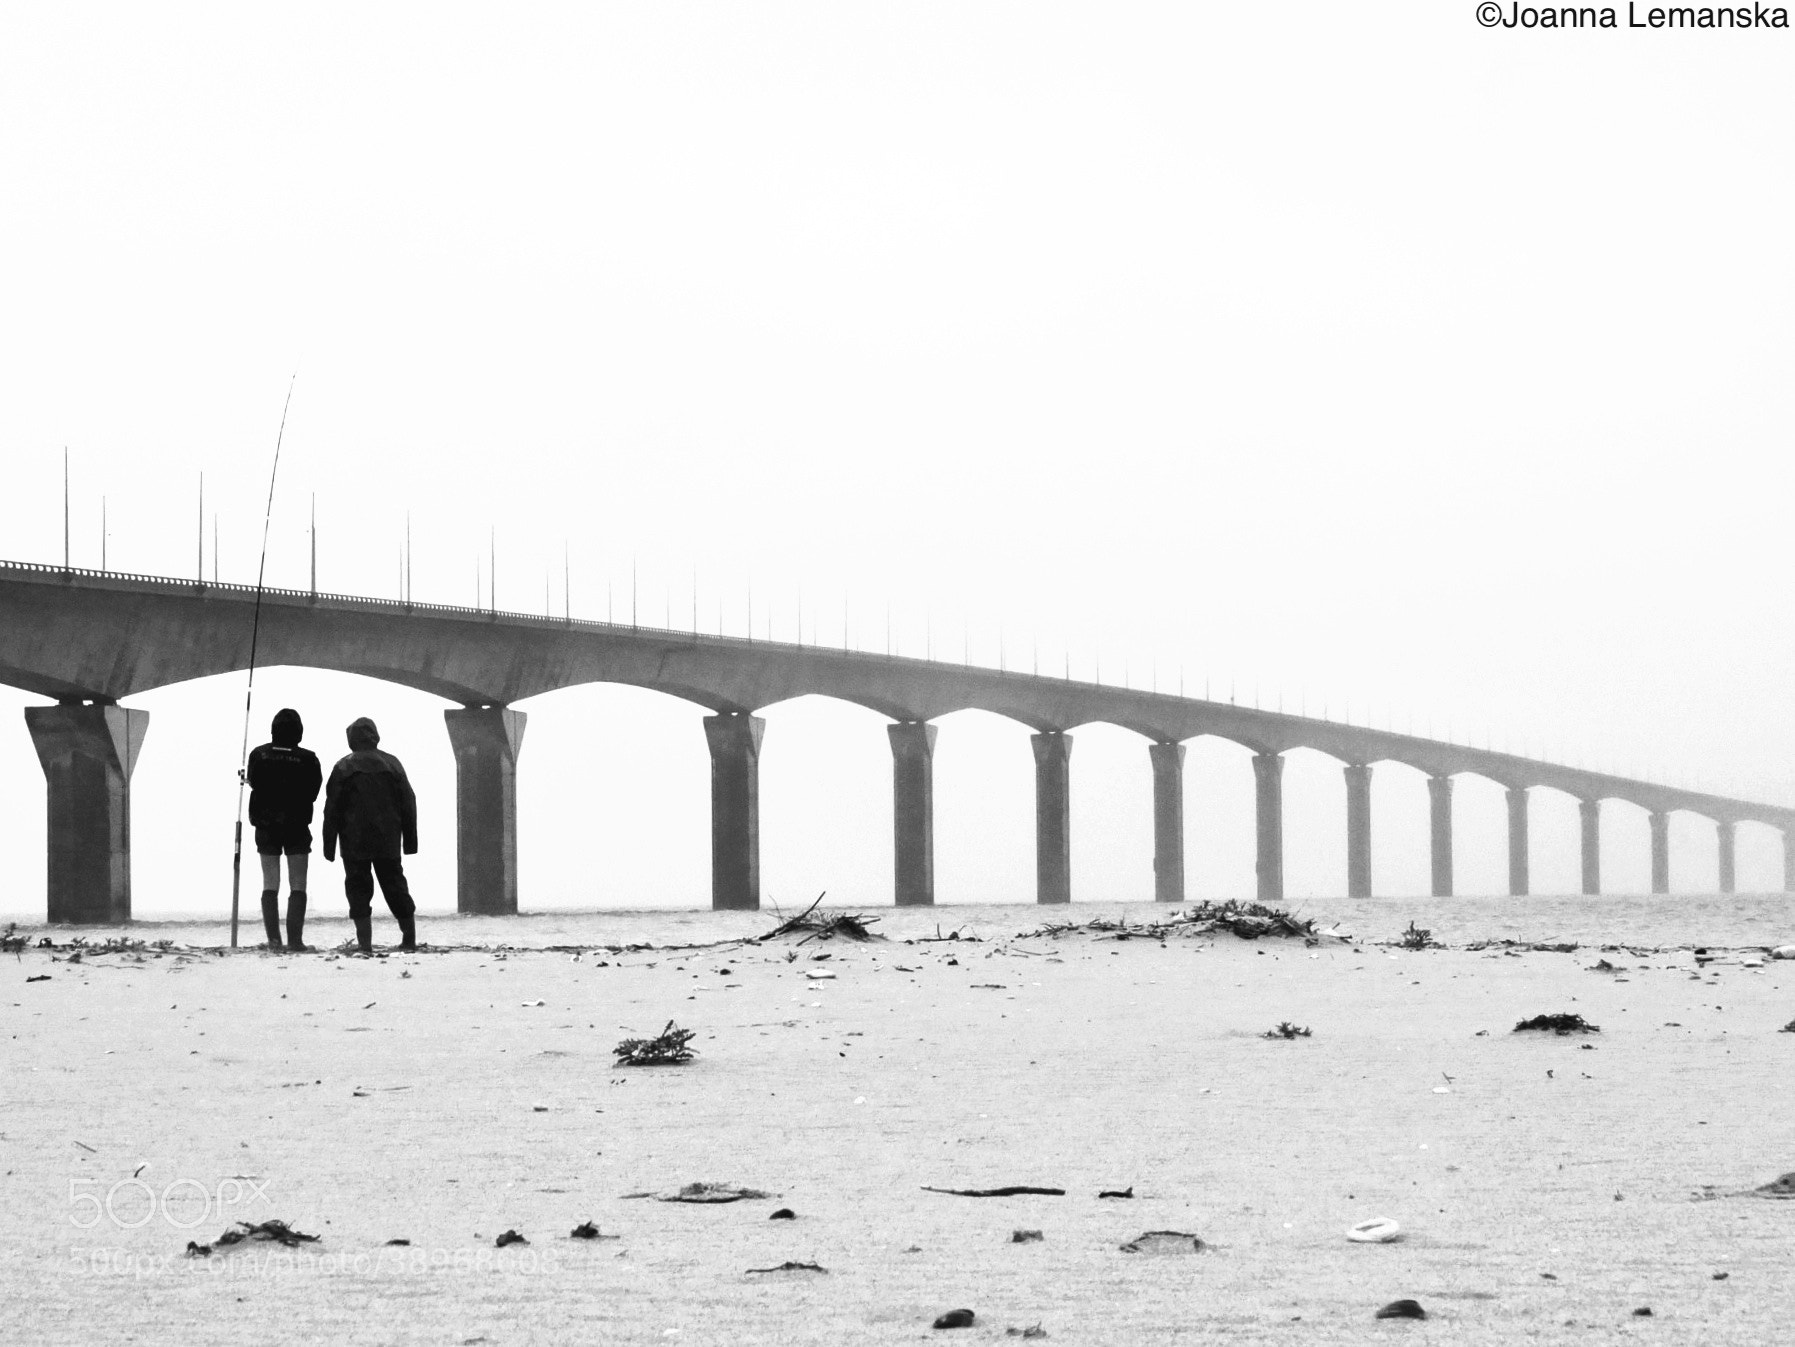 Photograph Fishermen by Joanna Lemanska on 500px